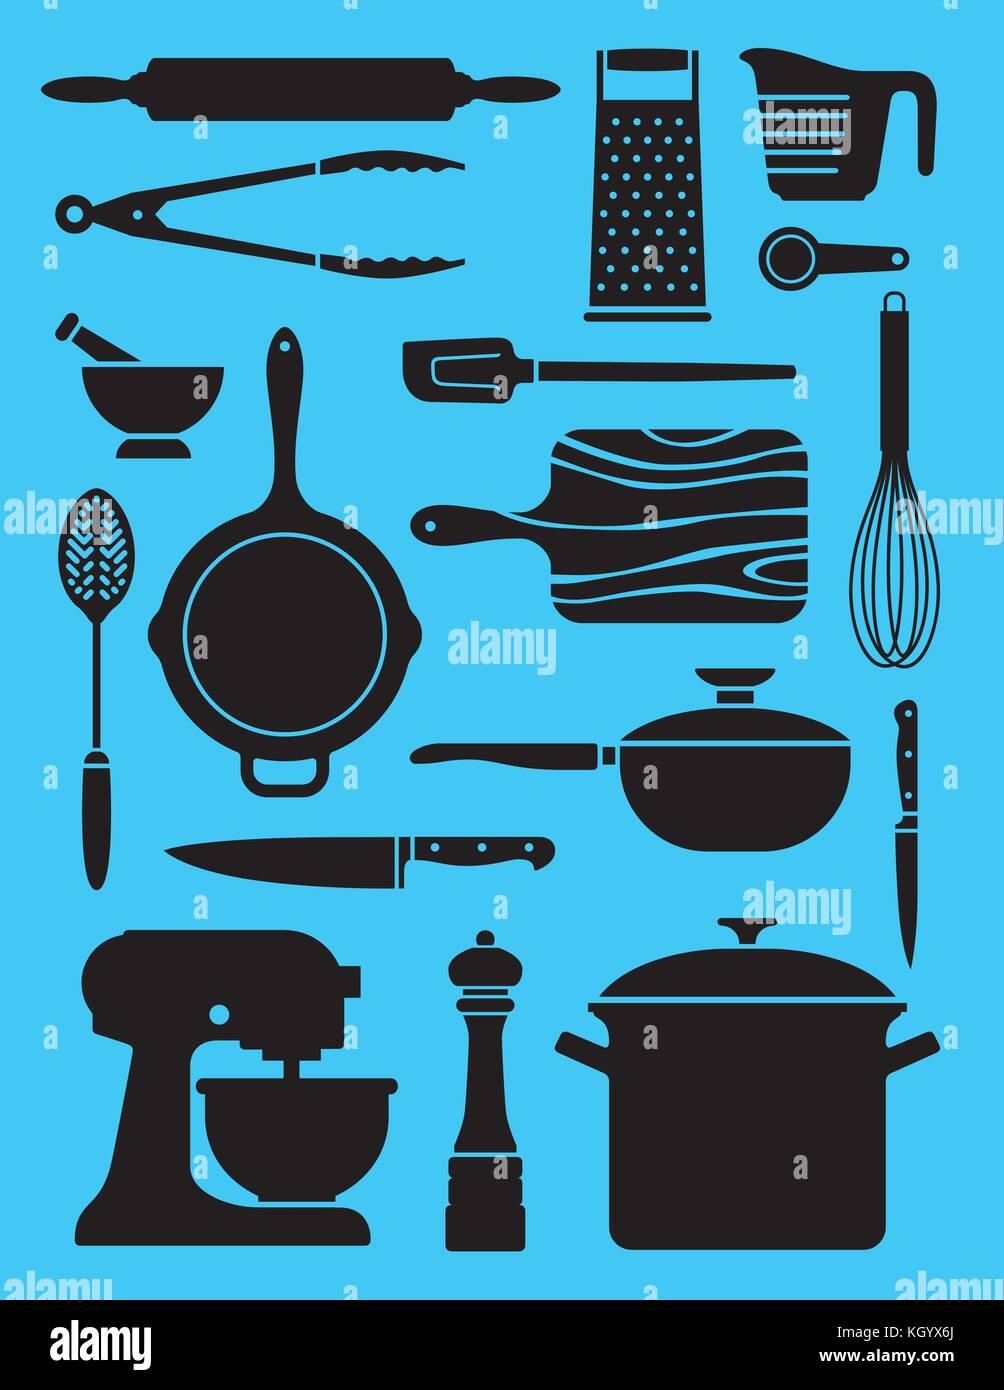 Set di utensili da cucina 17 illustrazioni. collage o pattern di ...